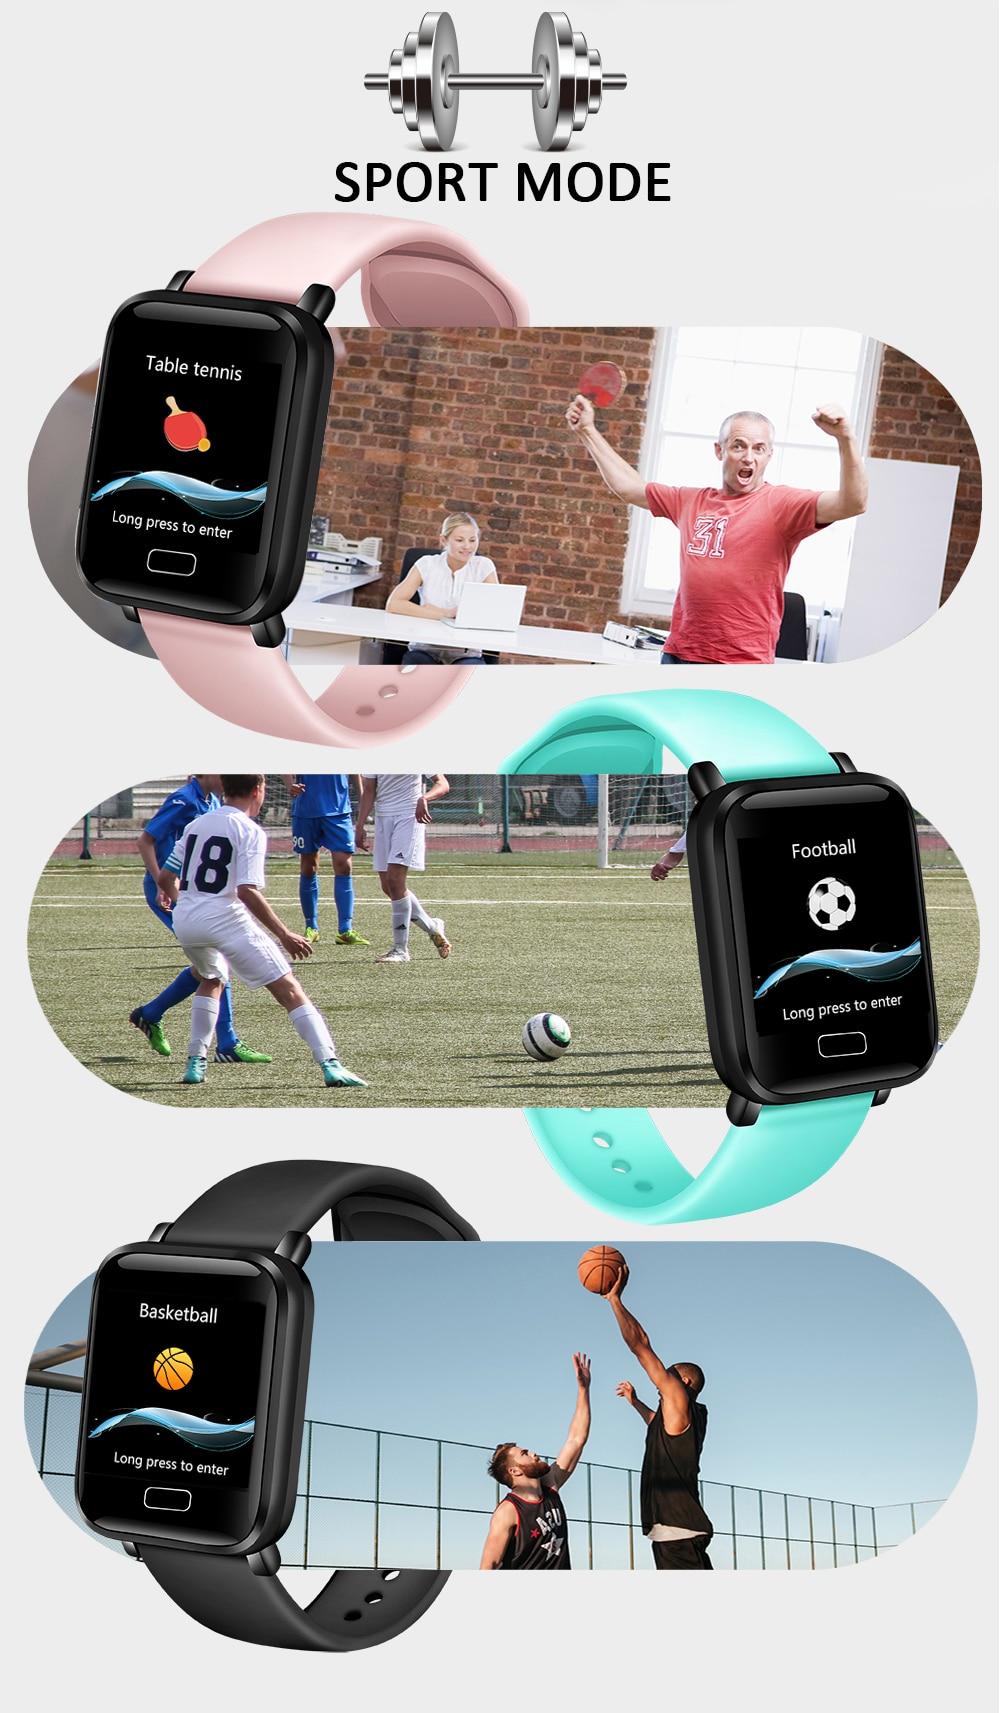 HTB1fA8aa5 1gK0jSZFqq6ApaXXaL LIGE Smart Bracelet Women IP67 Waterproof Fitness Tracker Wristband Pedometer Heart Rate Monitor Sport Smart watch Android ios